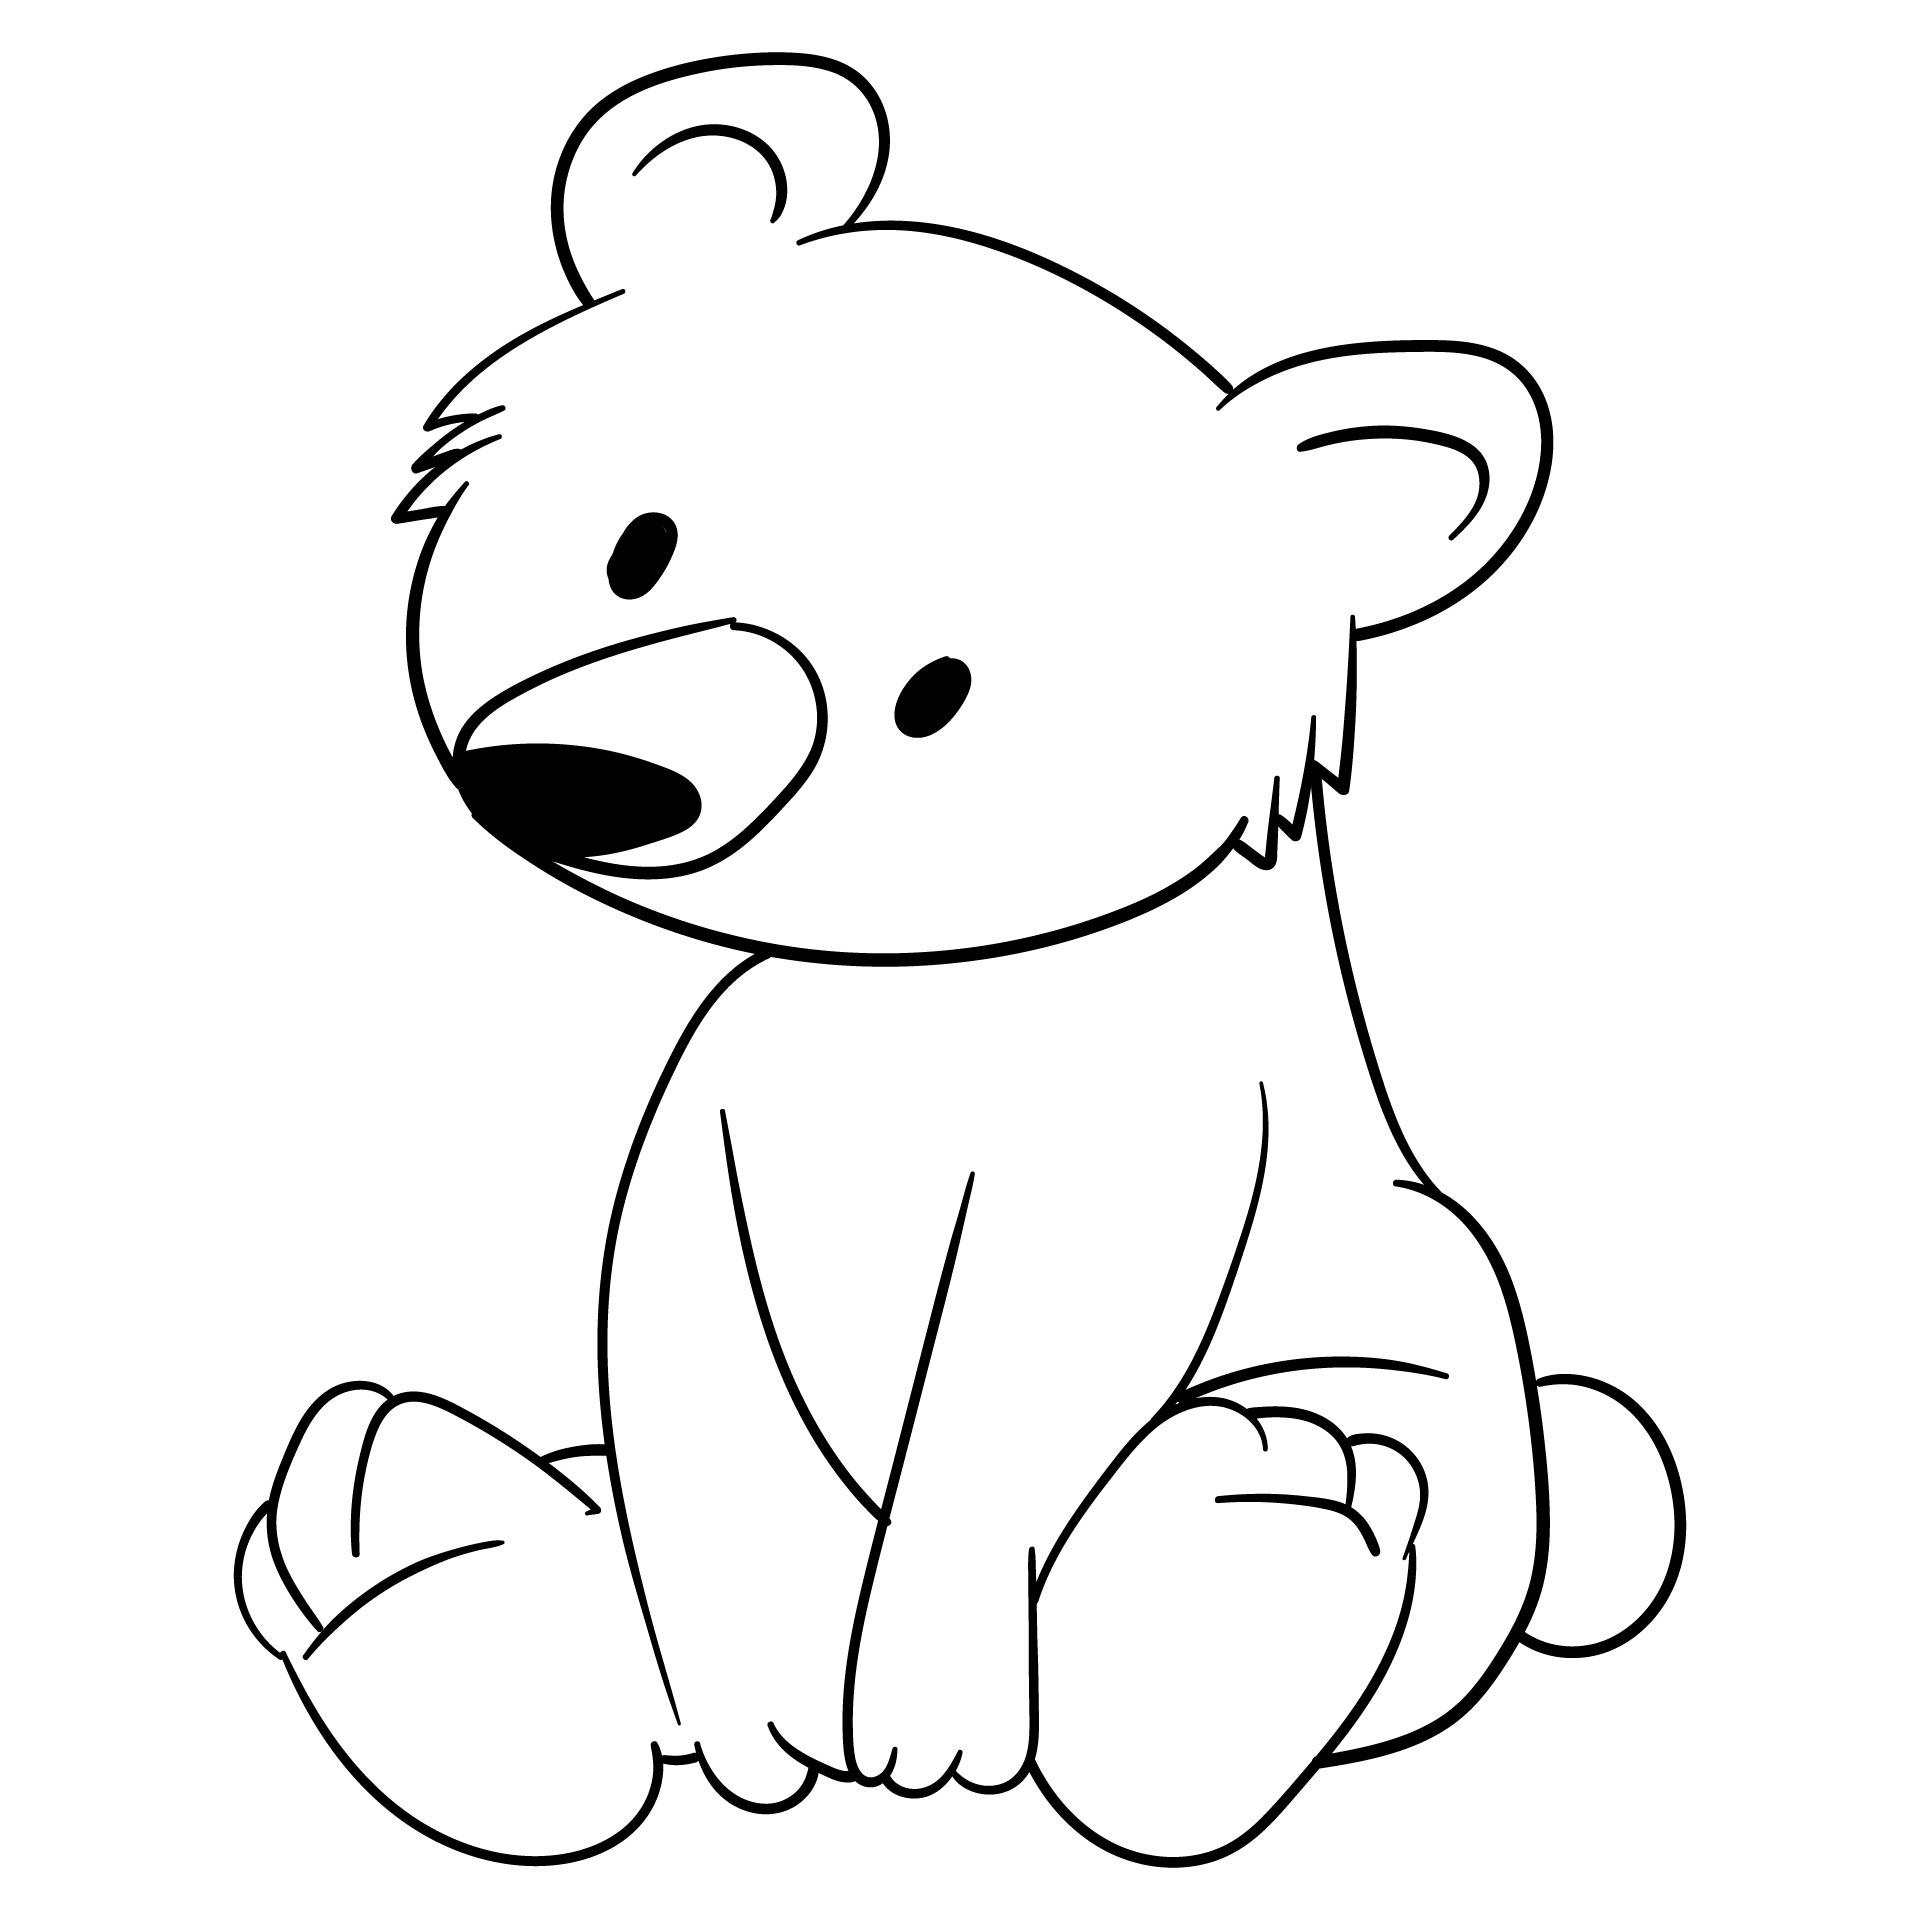 5 Best Images of Teddy Bear Template Printable - Teddy ...